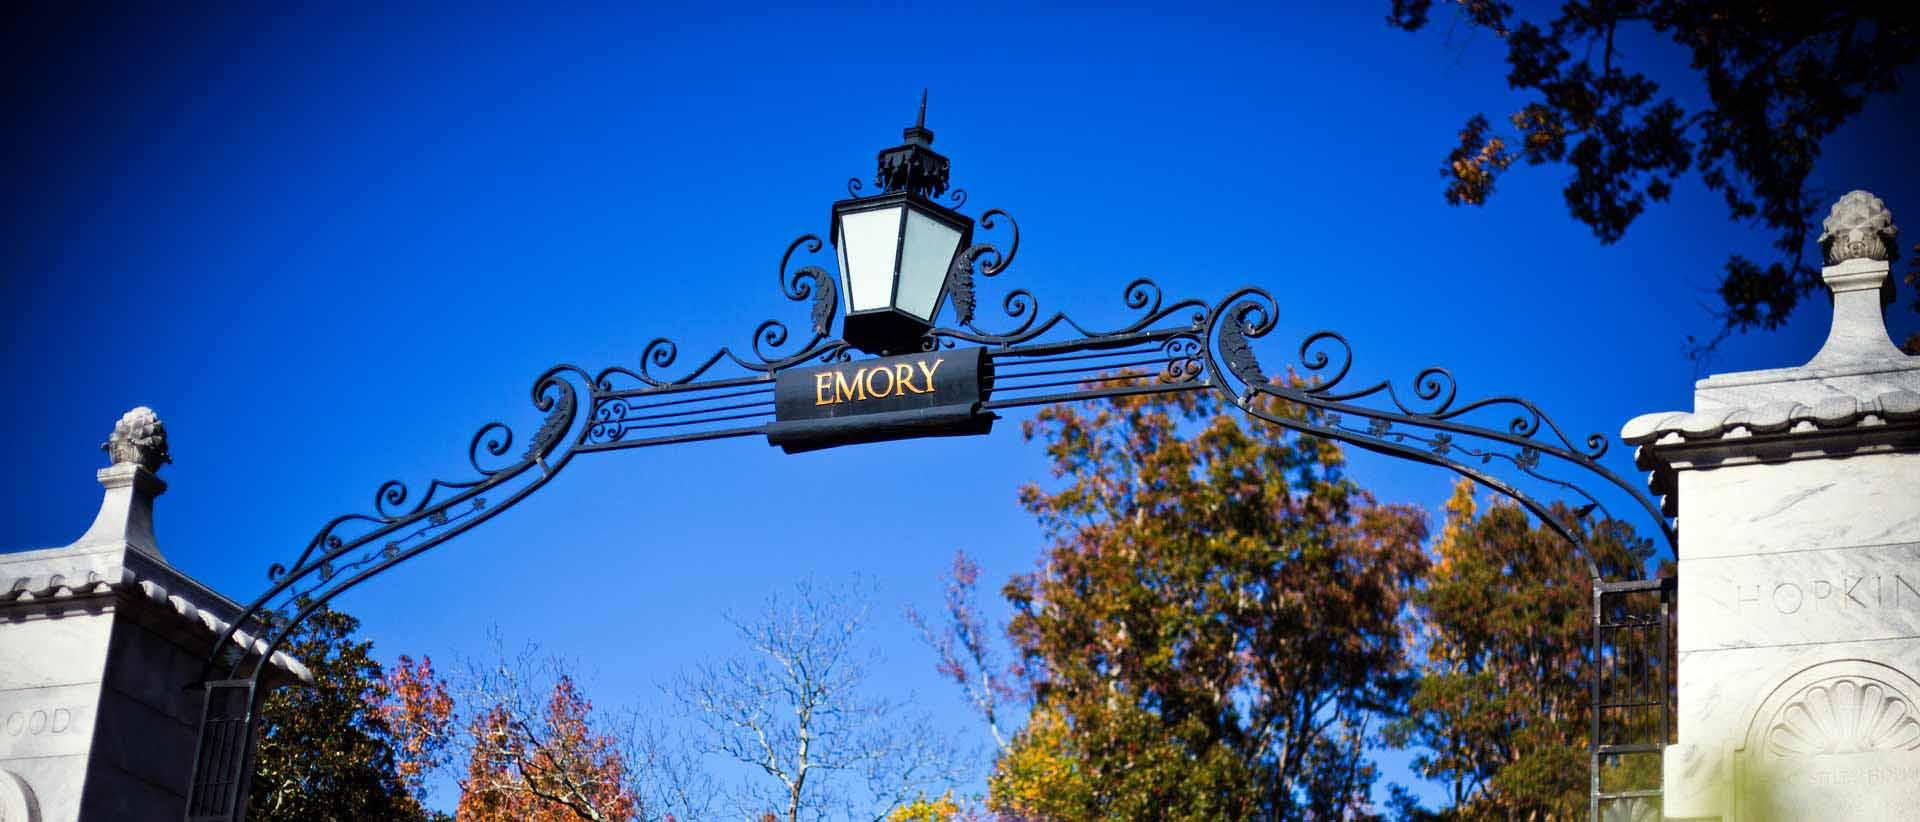 Emory University Events | Emory University | Atlanta GA